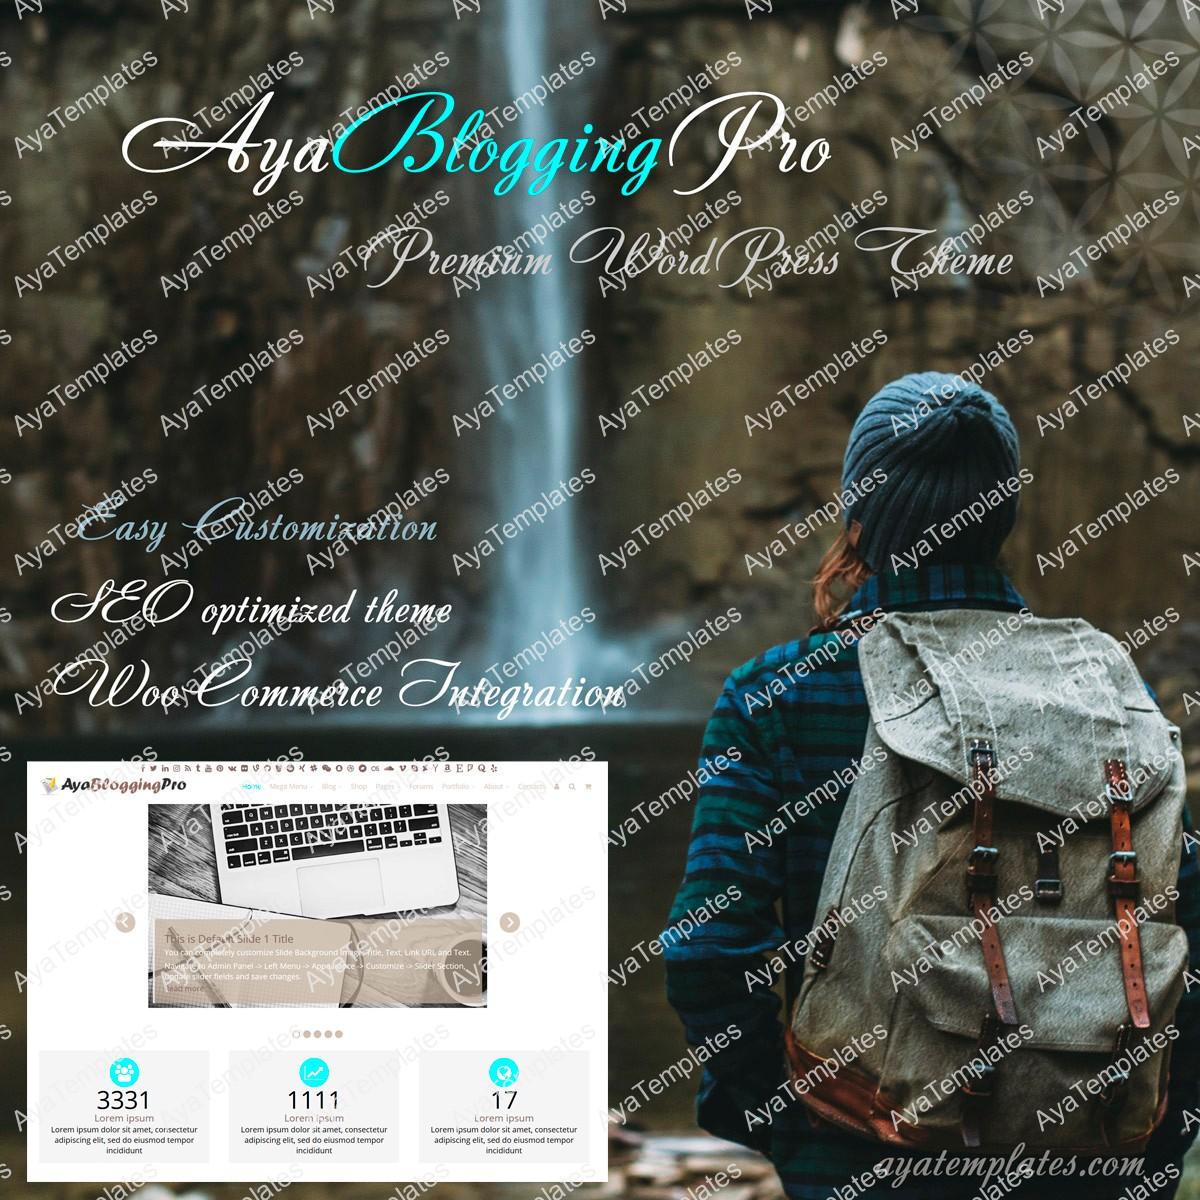 ayabloggingpro-premium-wordpress-theme-mockup-ayatemplates-com-collage